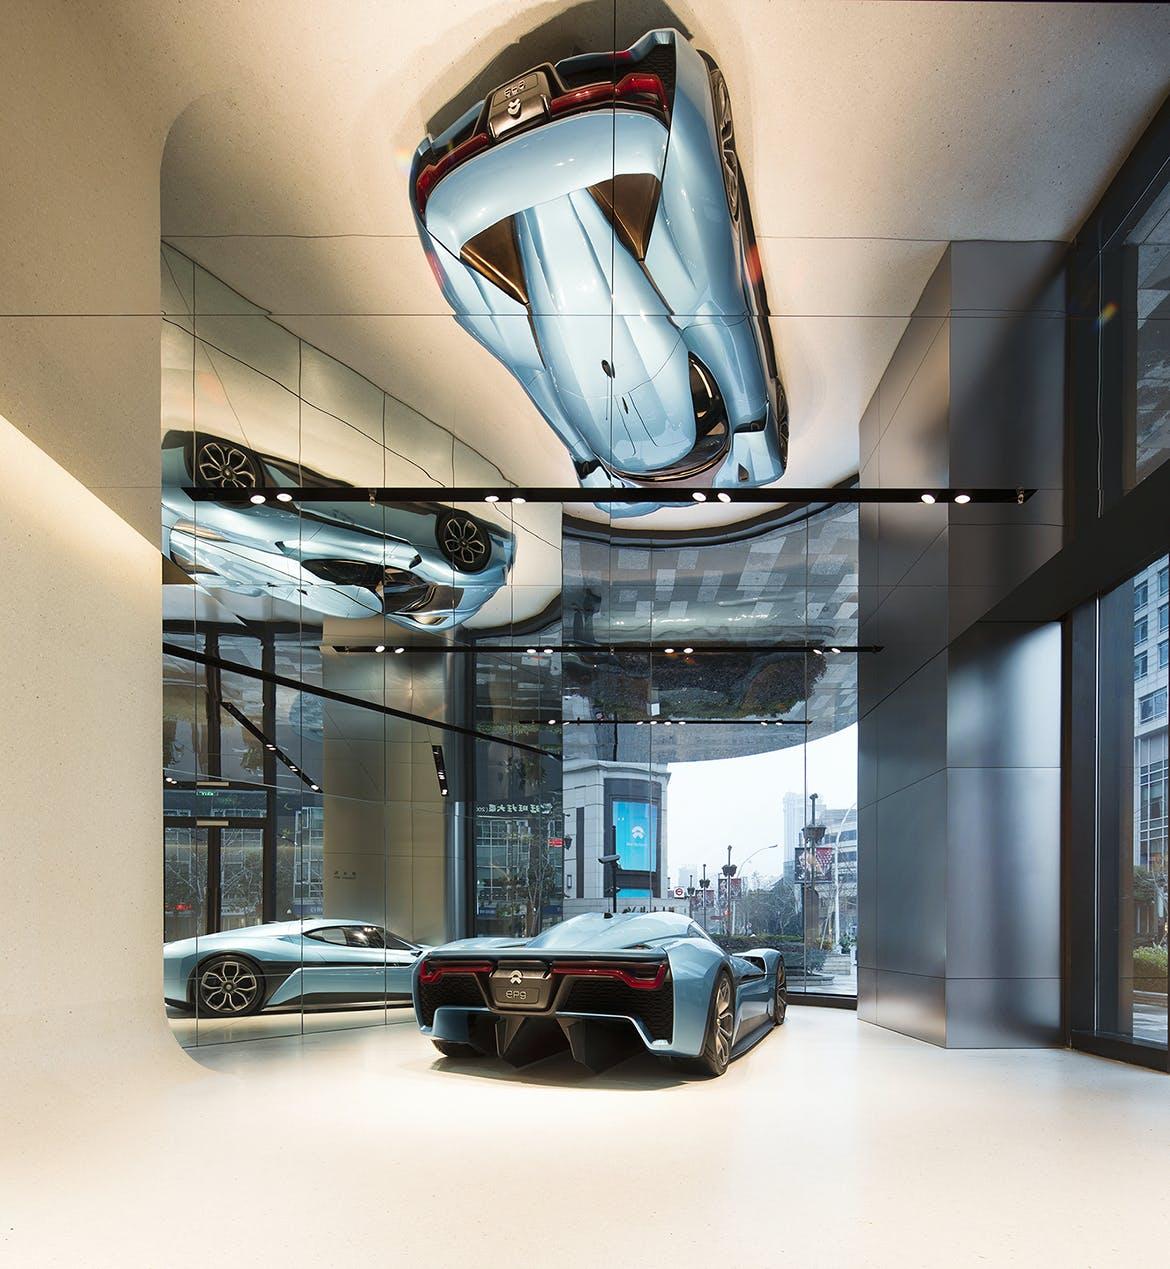 Automotive Showroom By Schmidt Hammer Lassen Architects Unifies Car